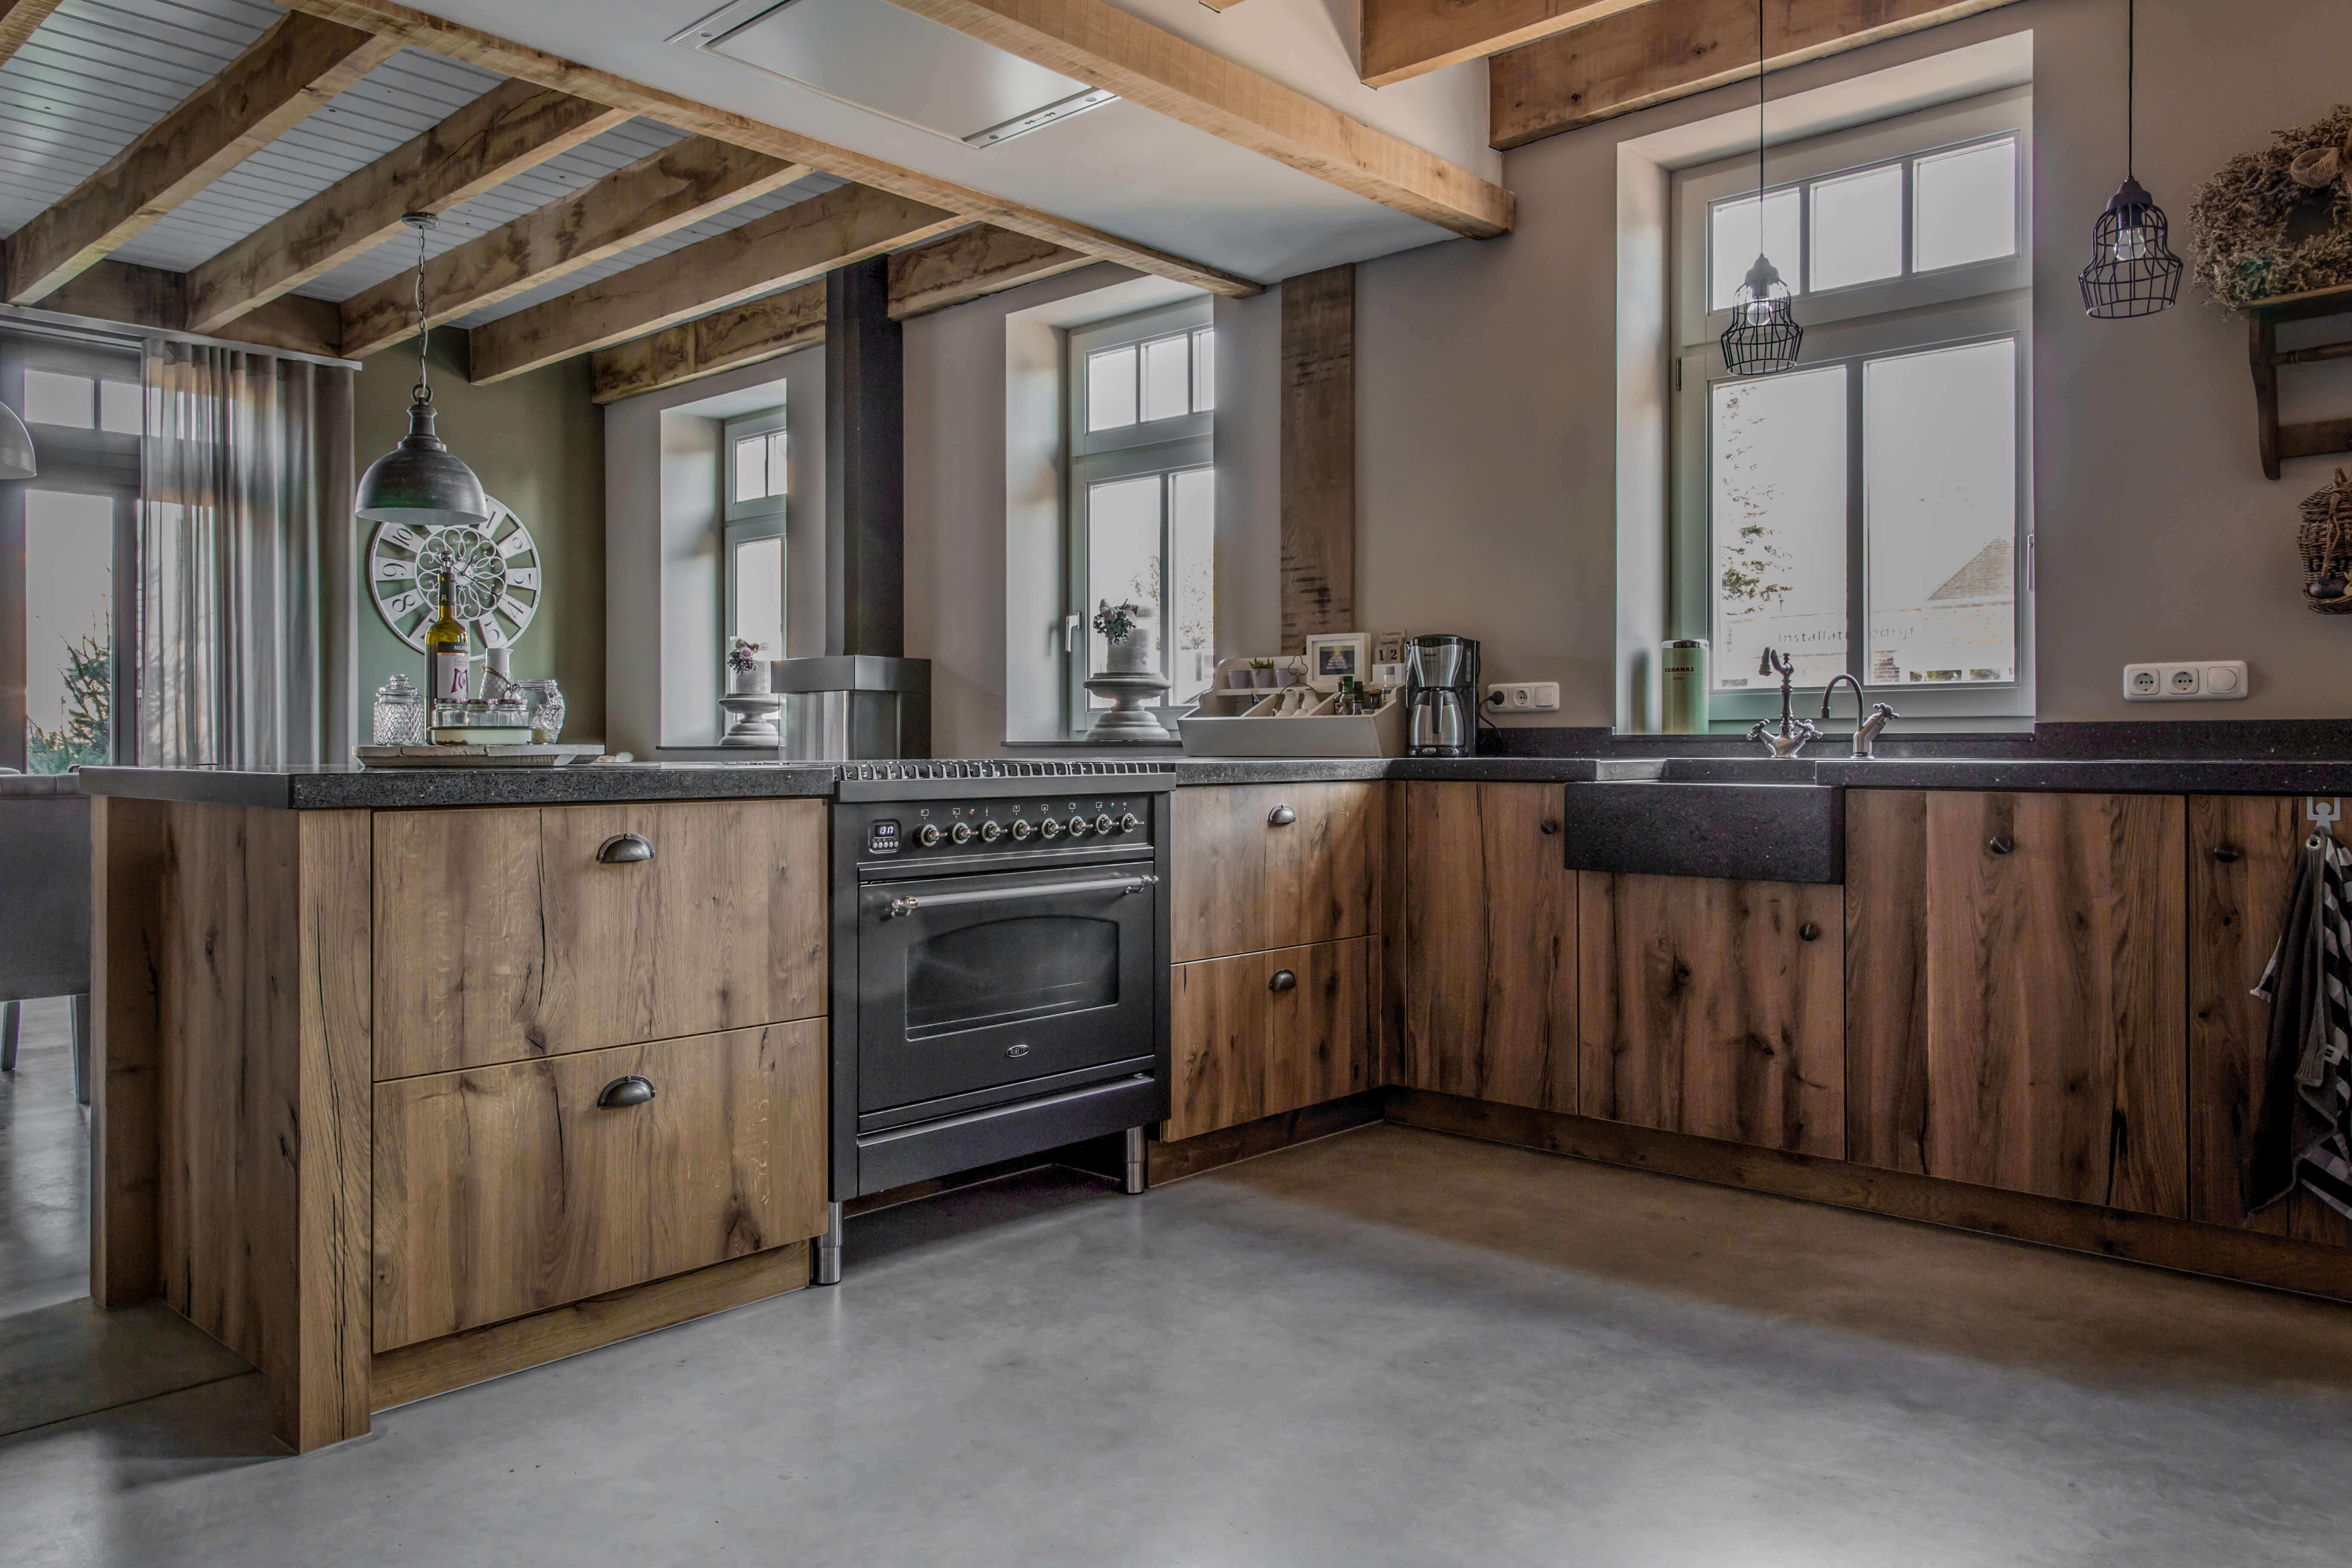 Stoere keukens